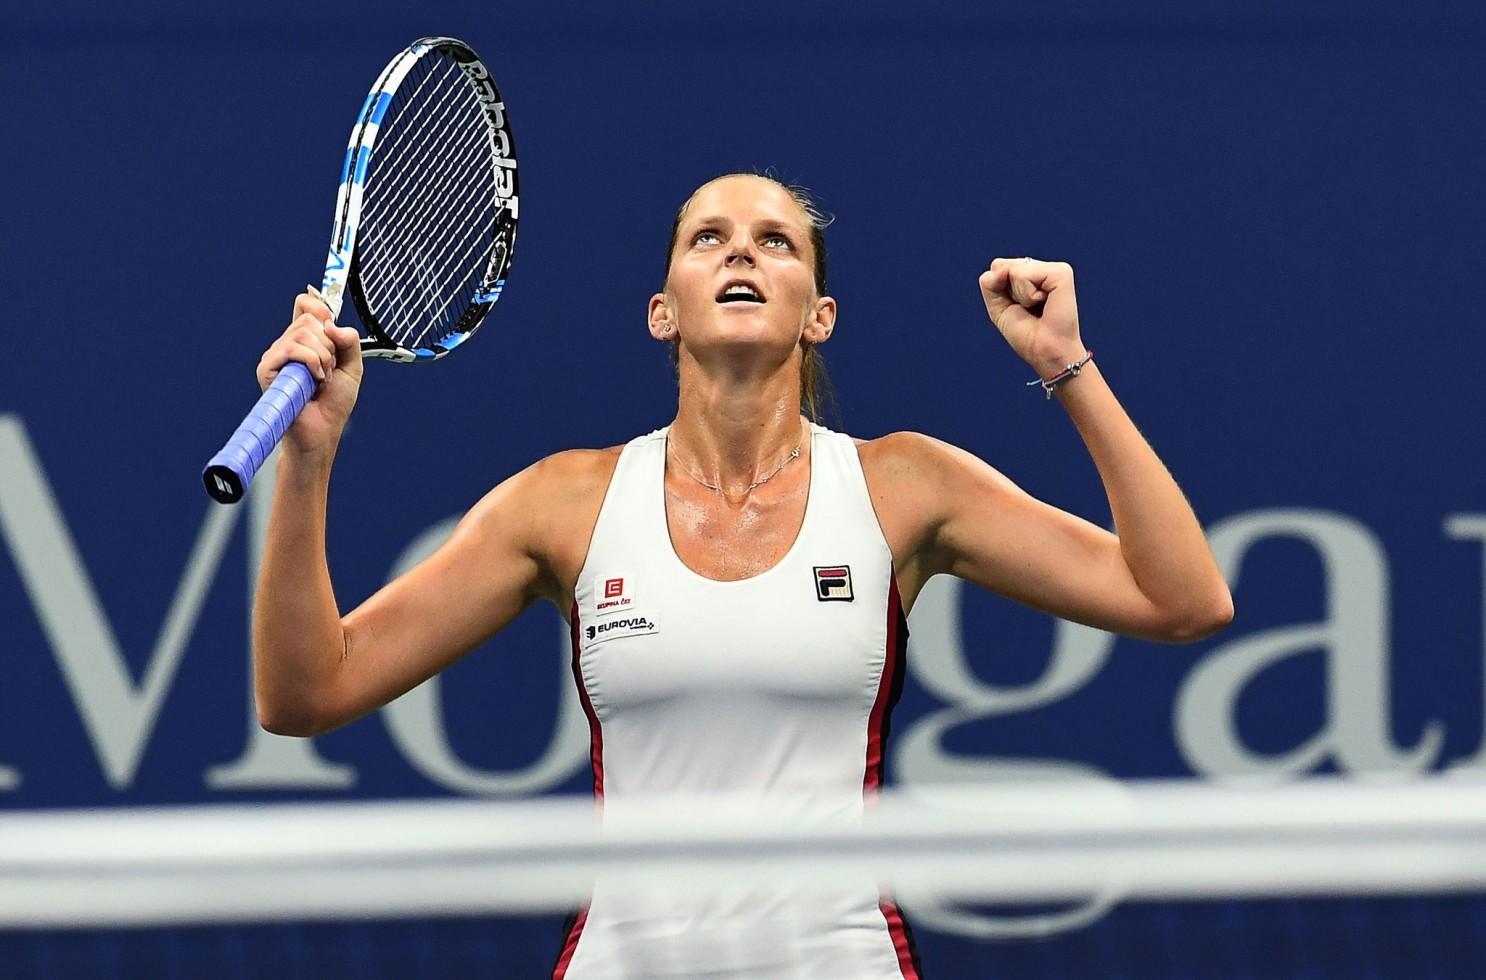 Karolina Pliskova vence dura estreia no US Open